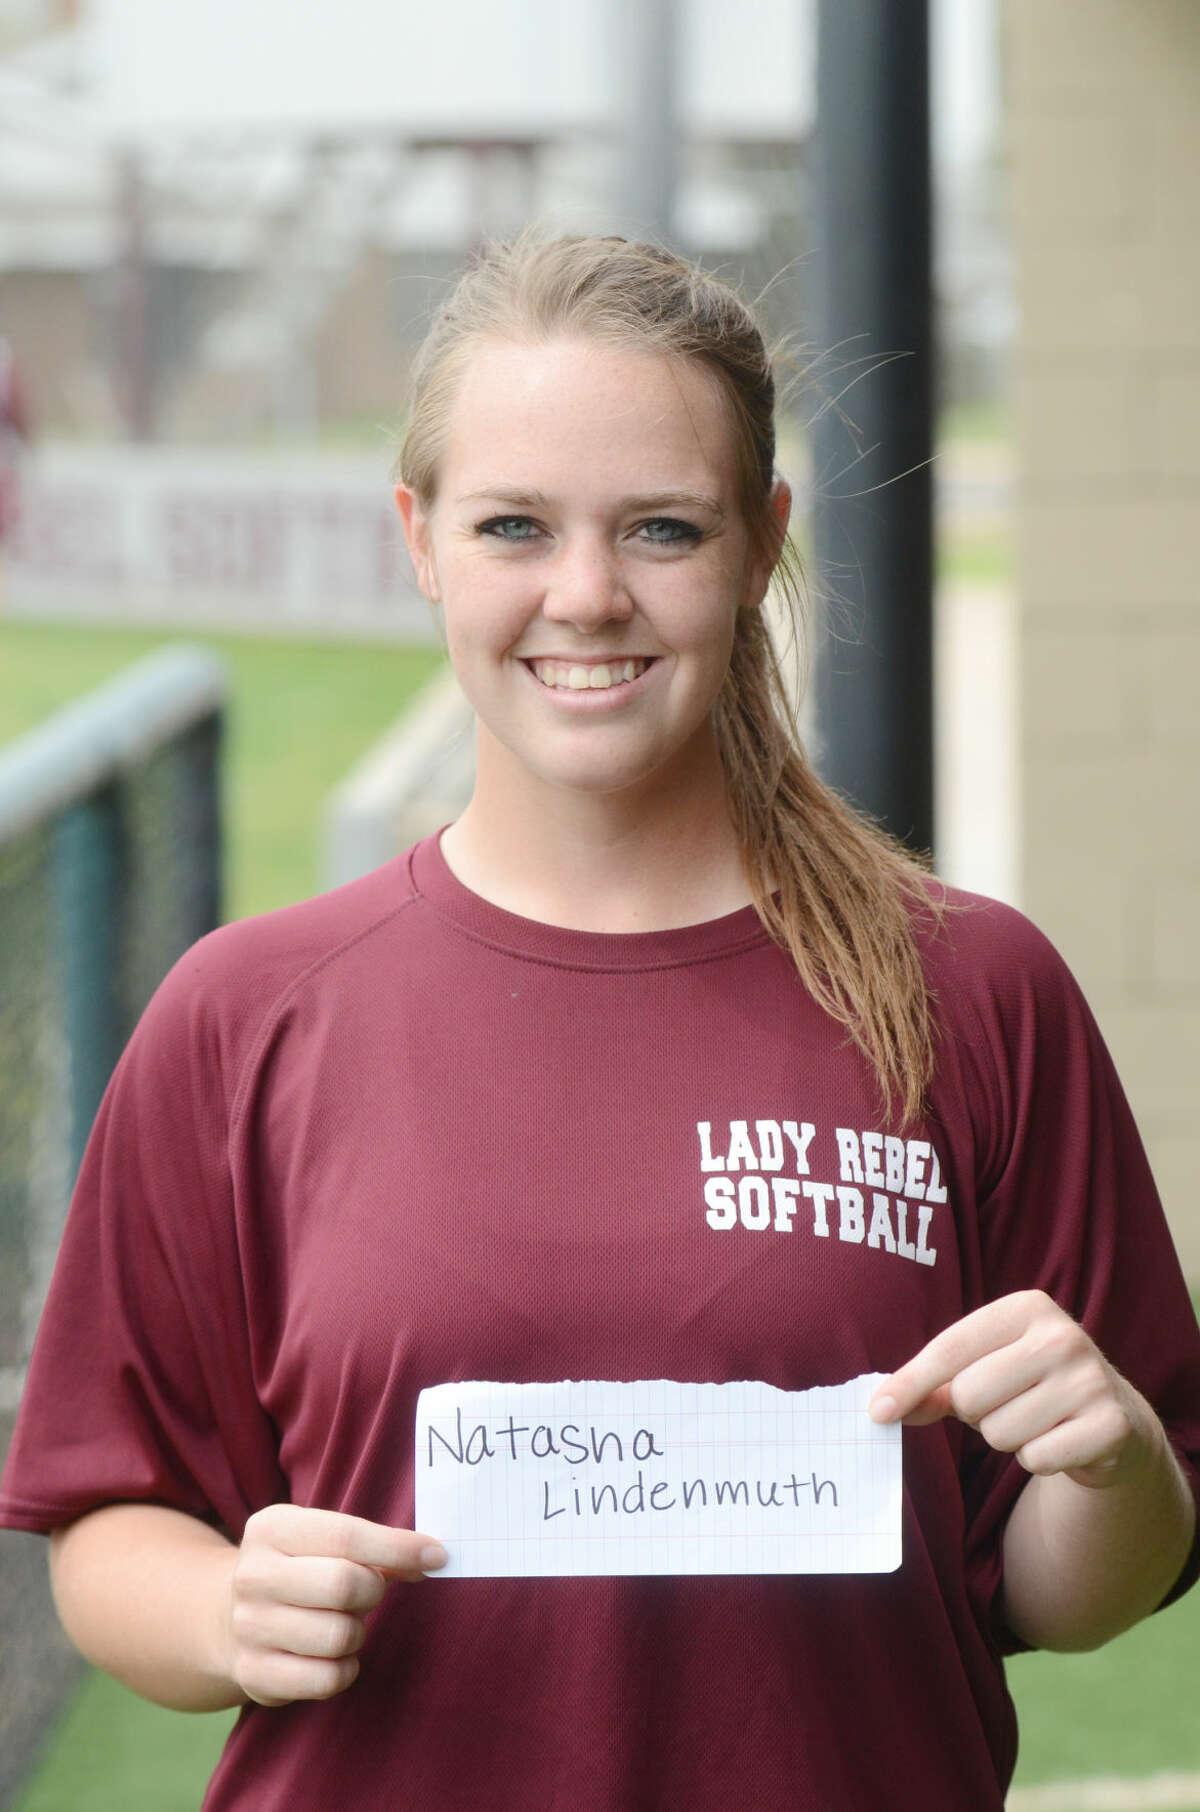 Lee High varsity softball mug - Natasha Lindenmuth James Durbin/Reporter-Telegram